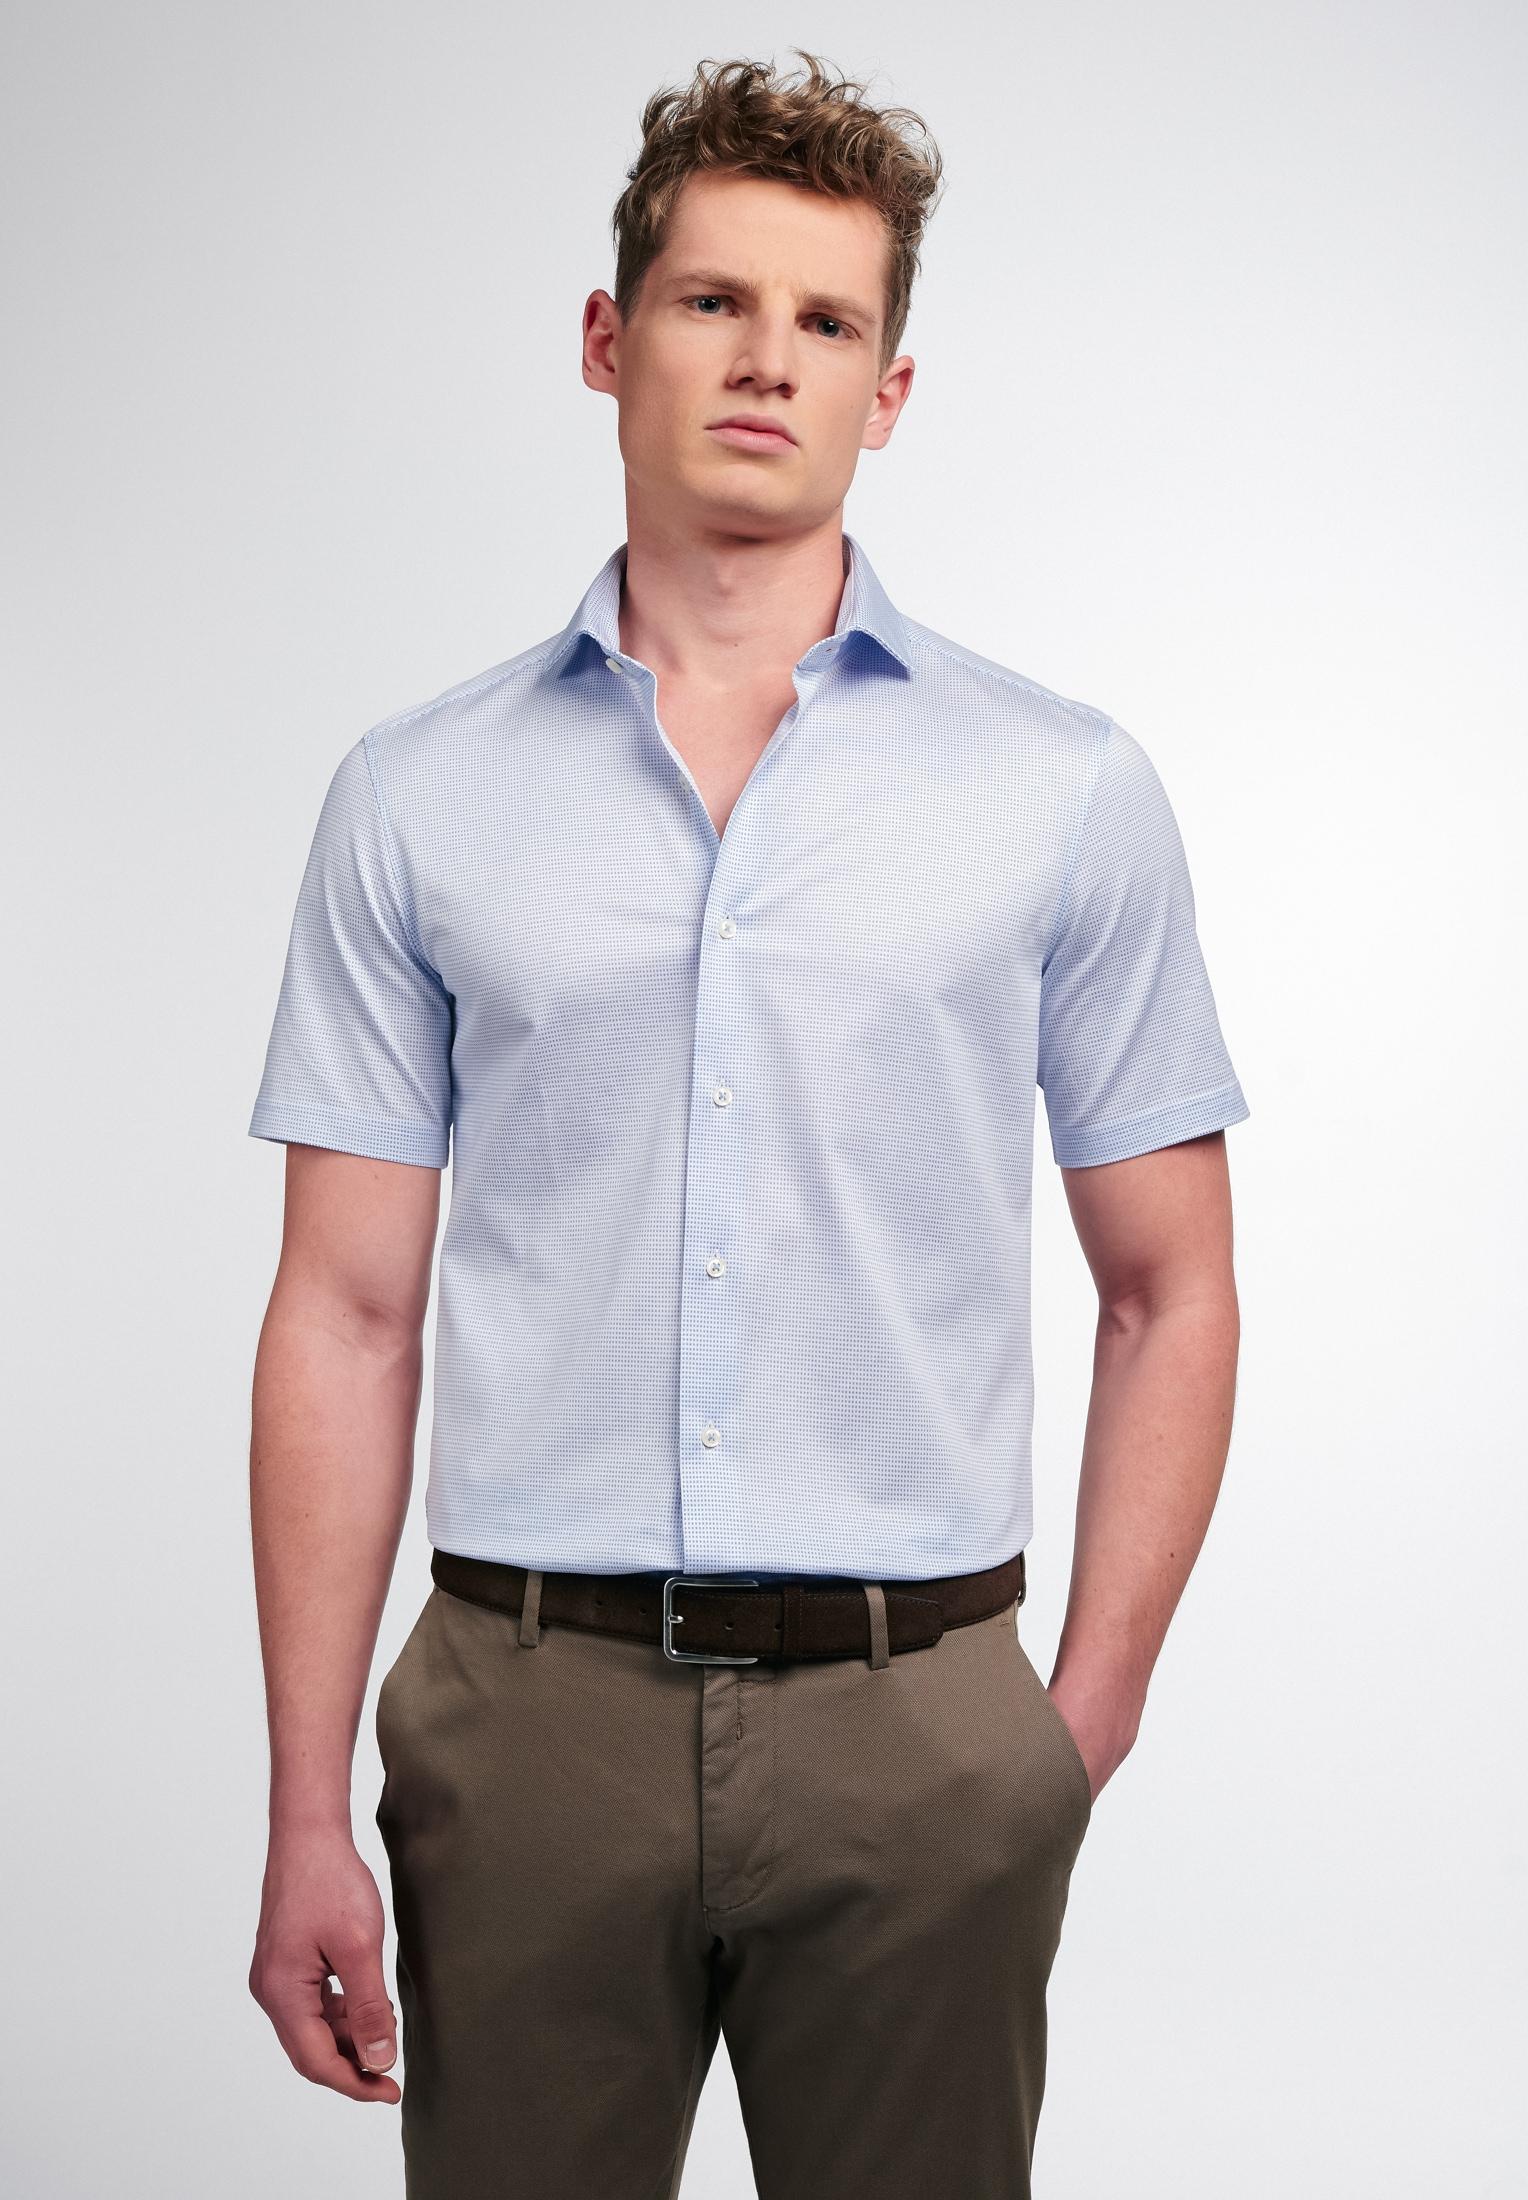 Eterna Businesshemd SLIM FIT, Kurzarm blau Herren Business Hemden Businessmode